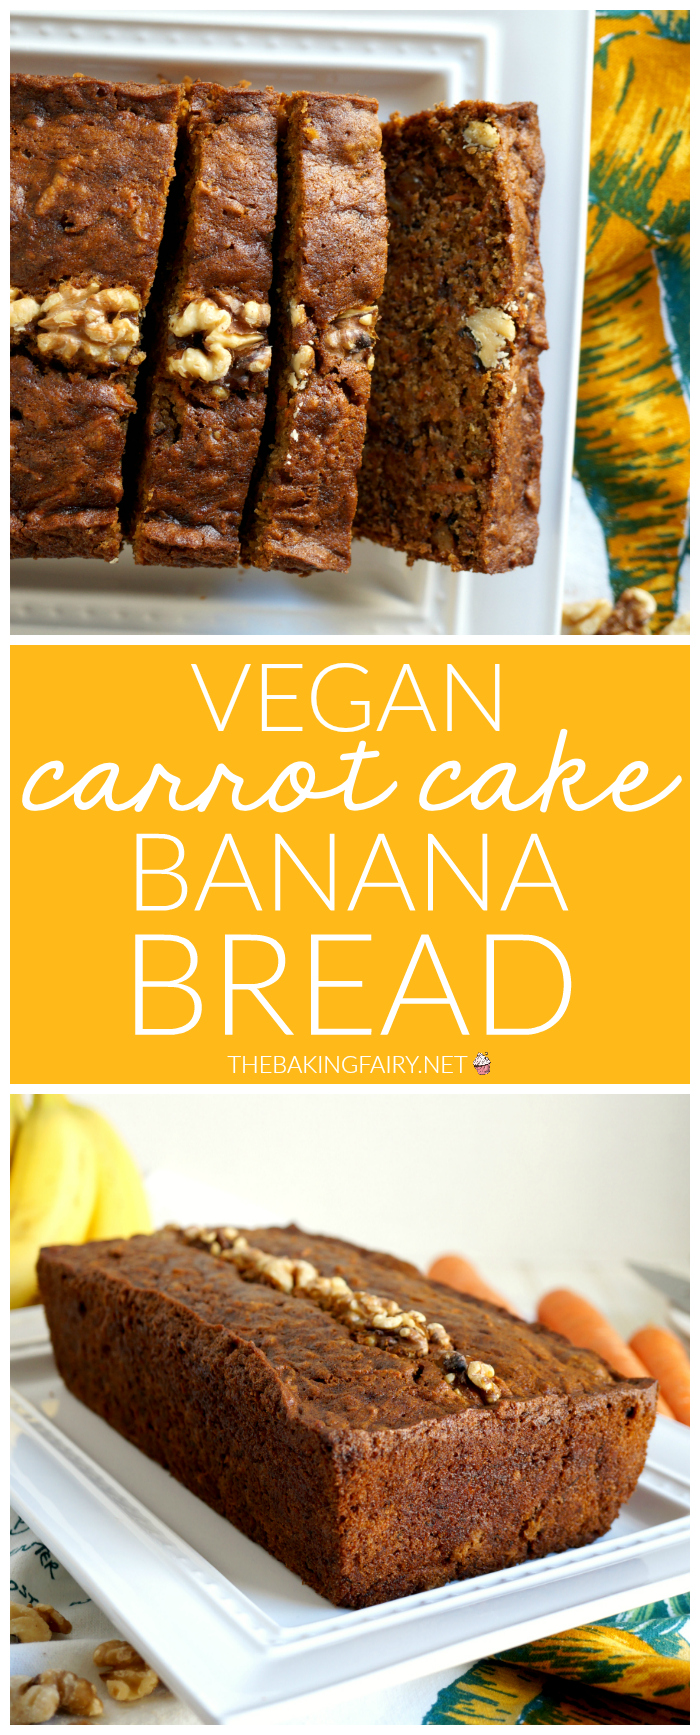 vegan carrot cake banana bread   The Baking Fairy